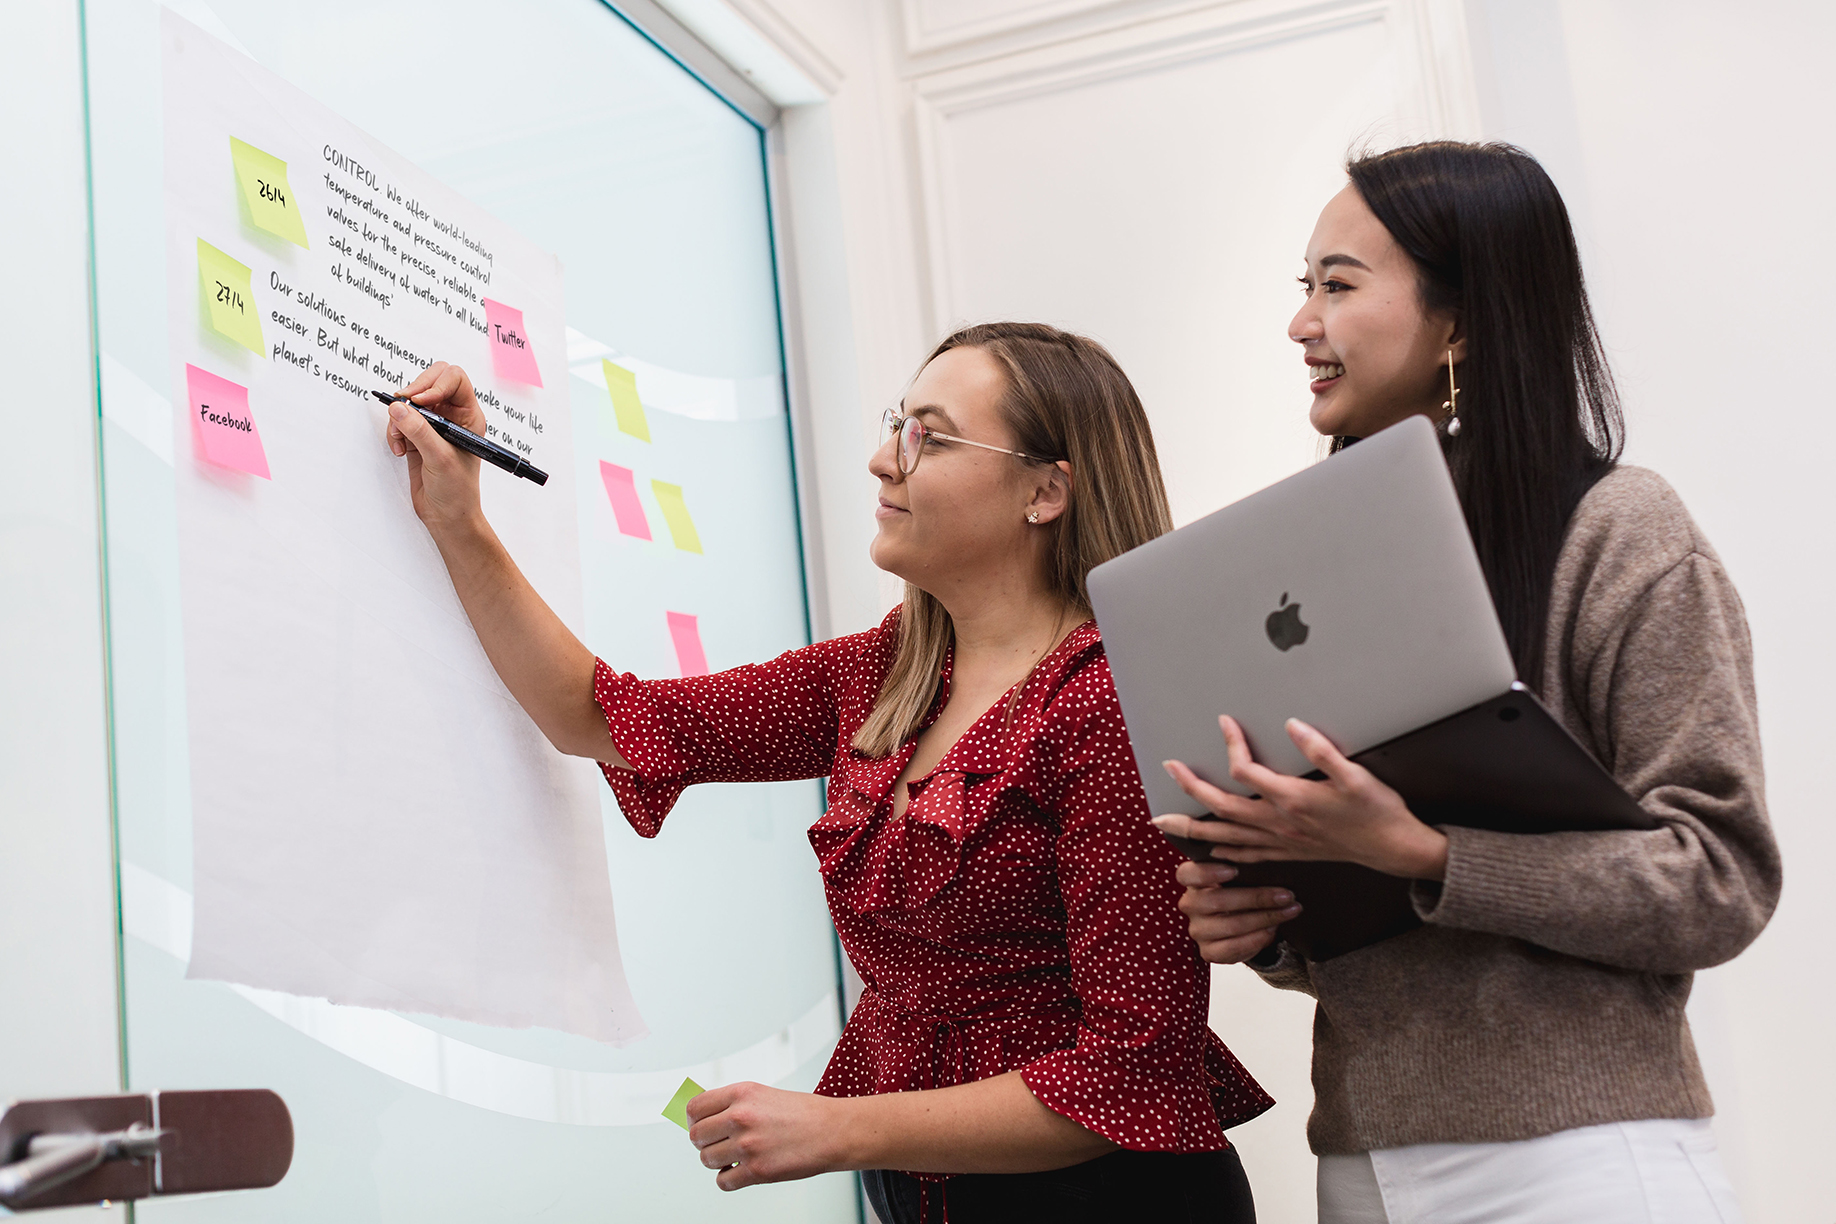 Sarah Turpin looking at a PR & content marketing strategy